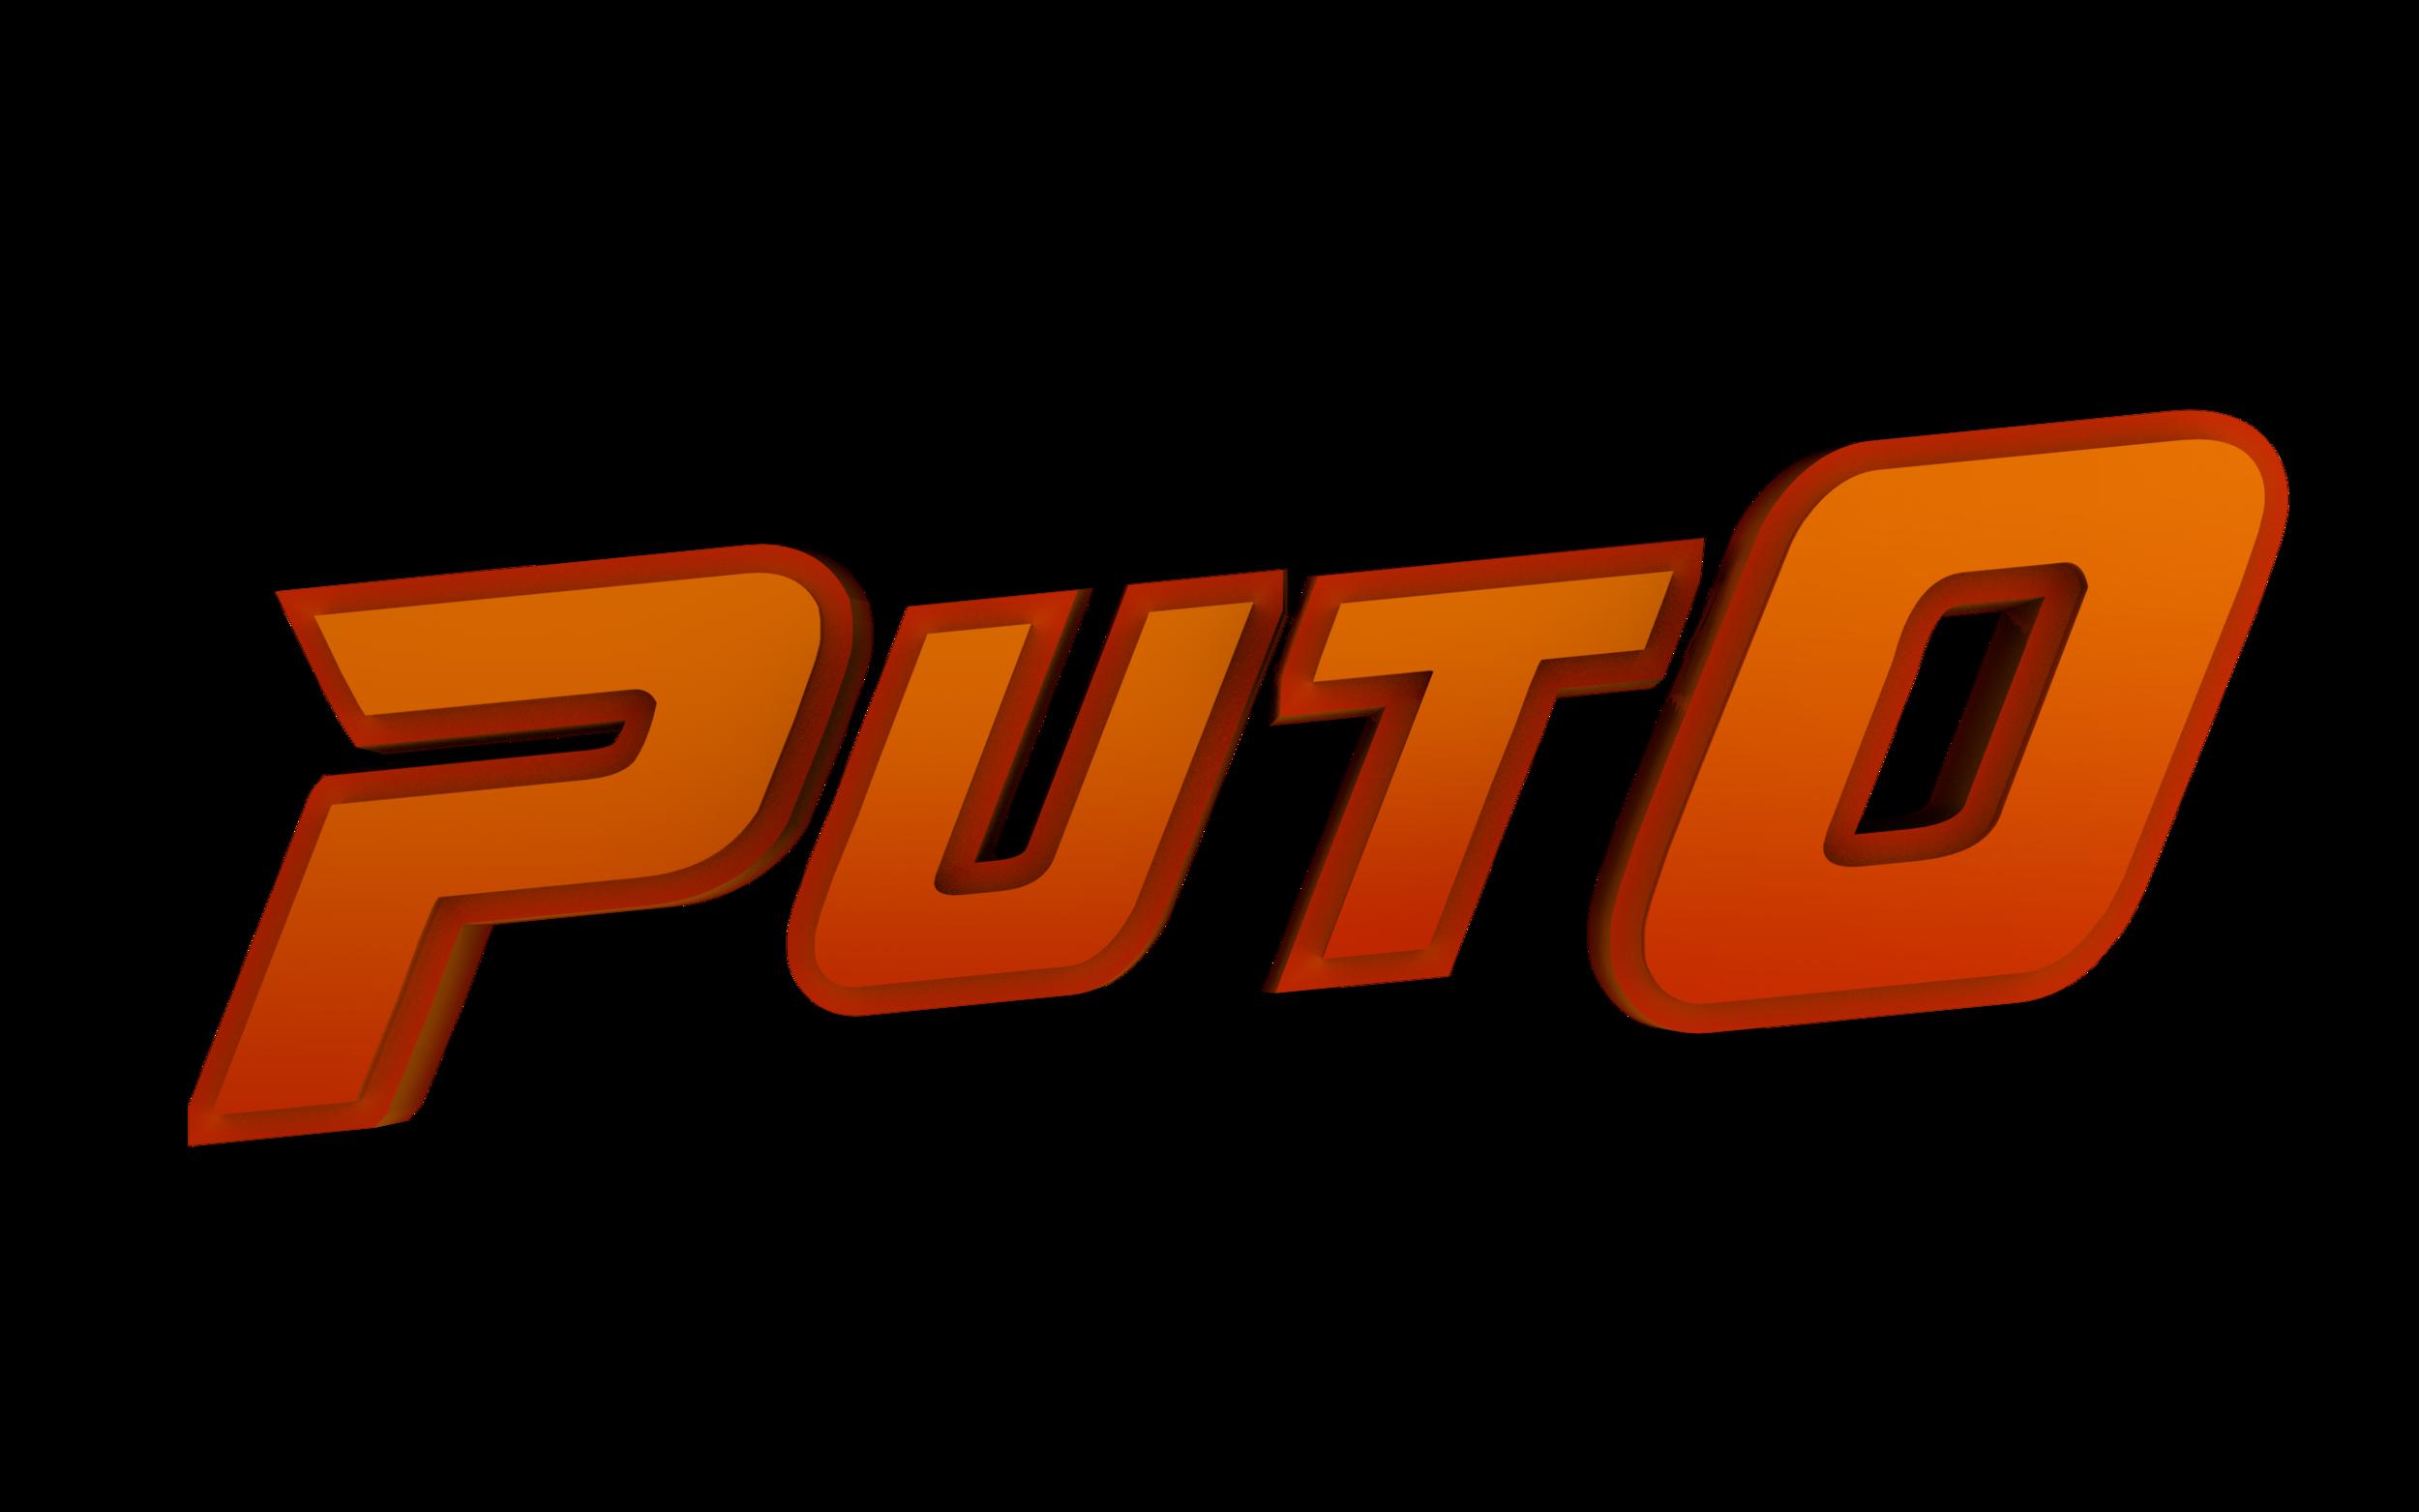 puto-logo 2.png